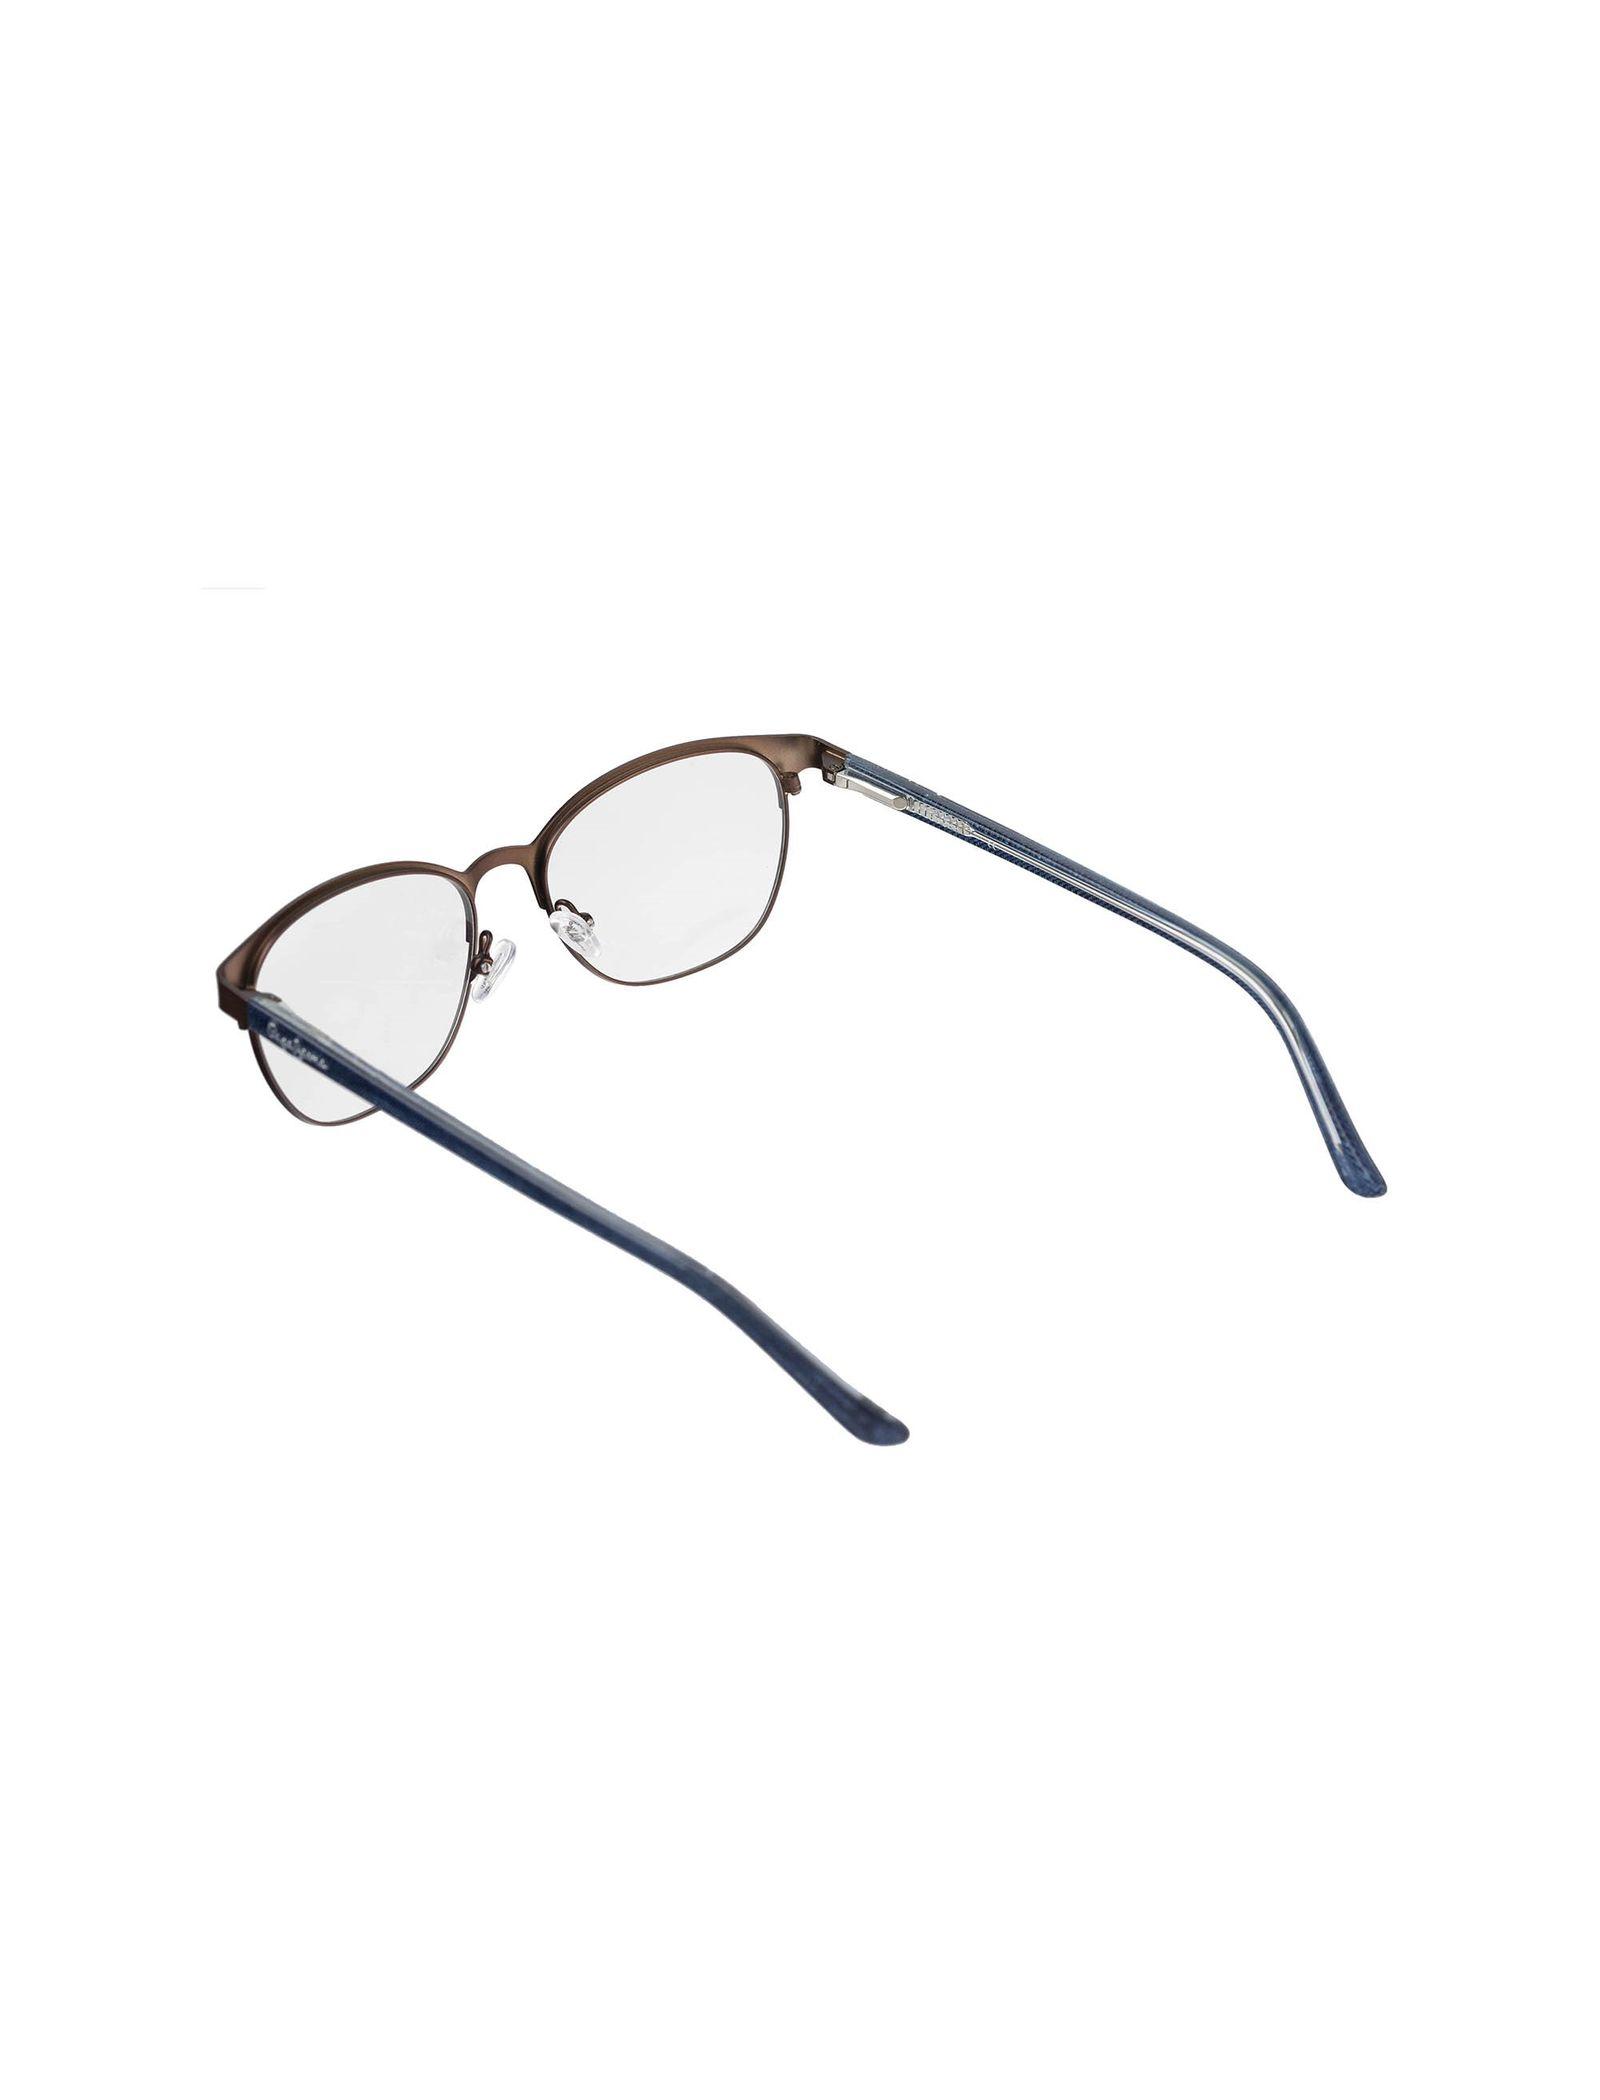 عینک طبی ویفرر زنانه - پپه جینز - قهوه اي - 3